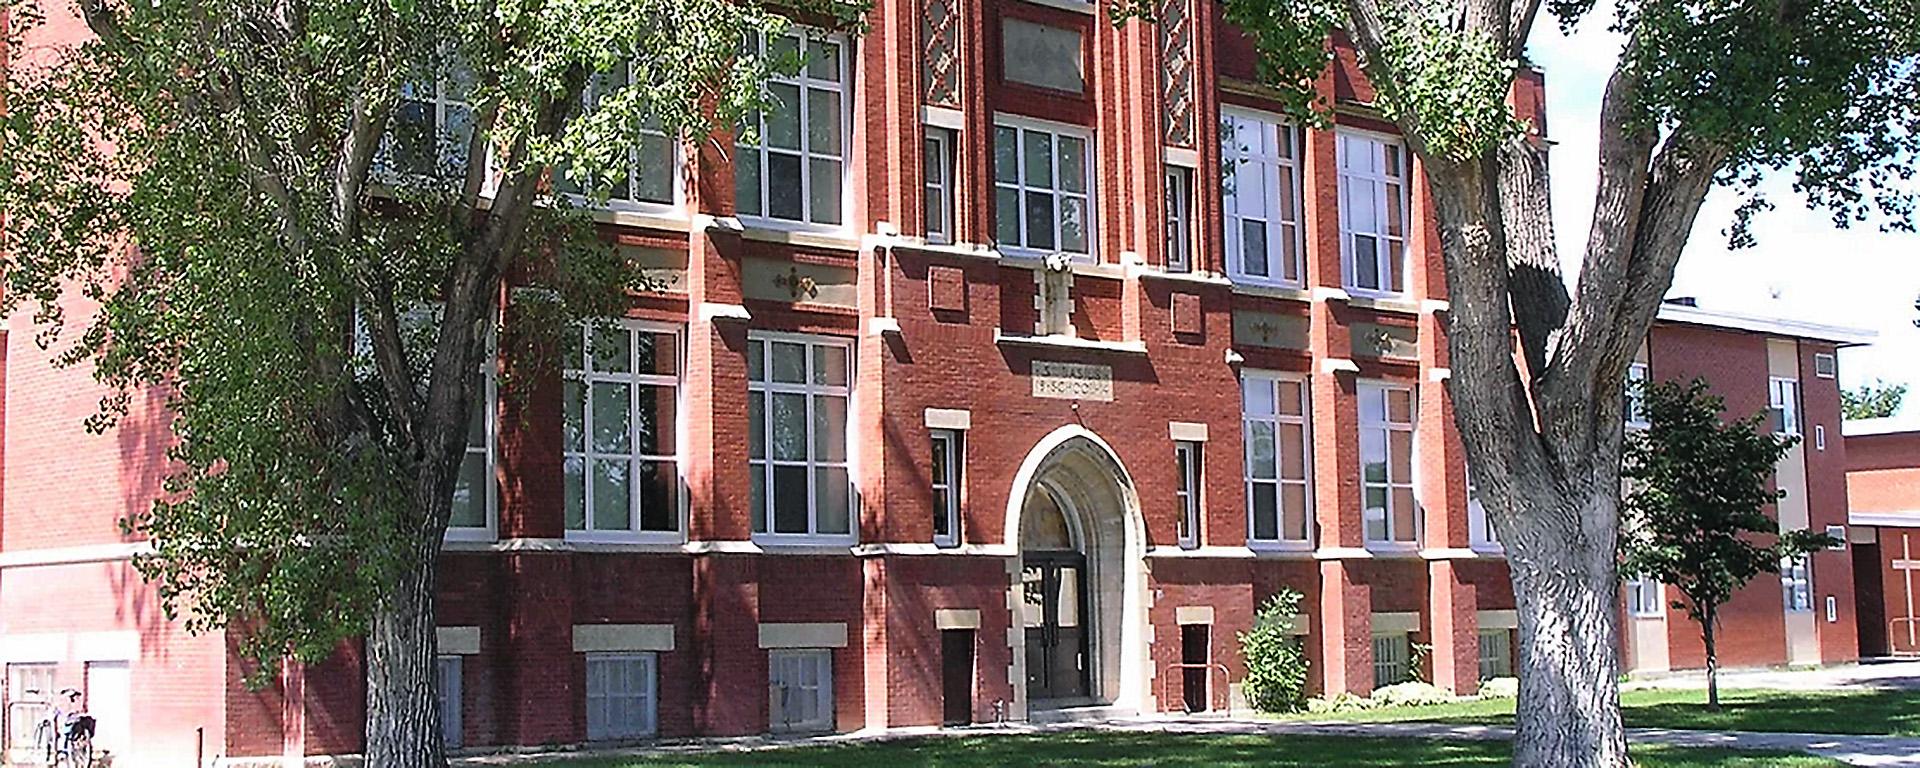 Commercial windows installed in school building